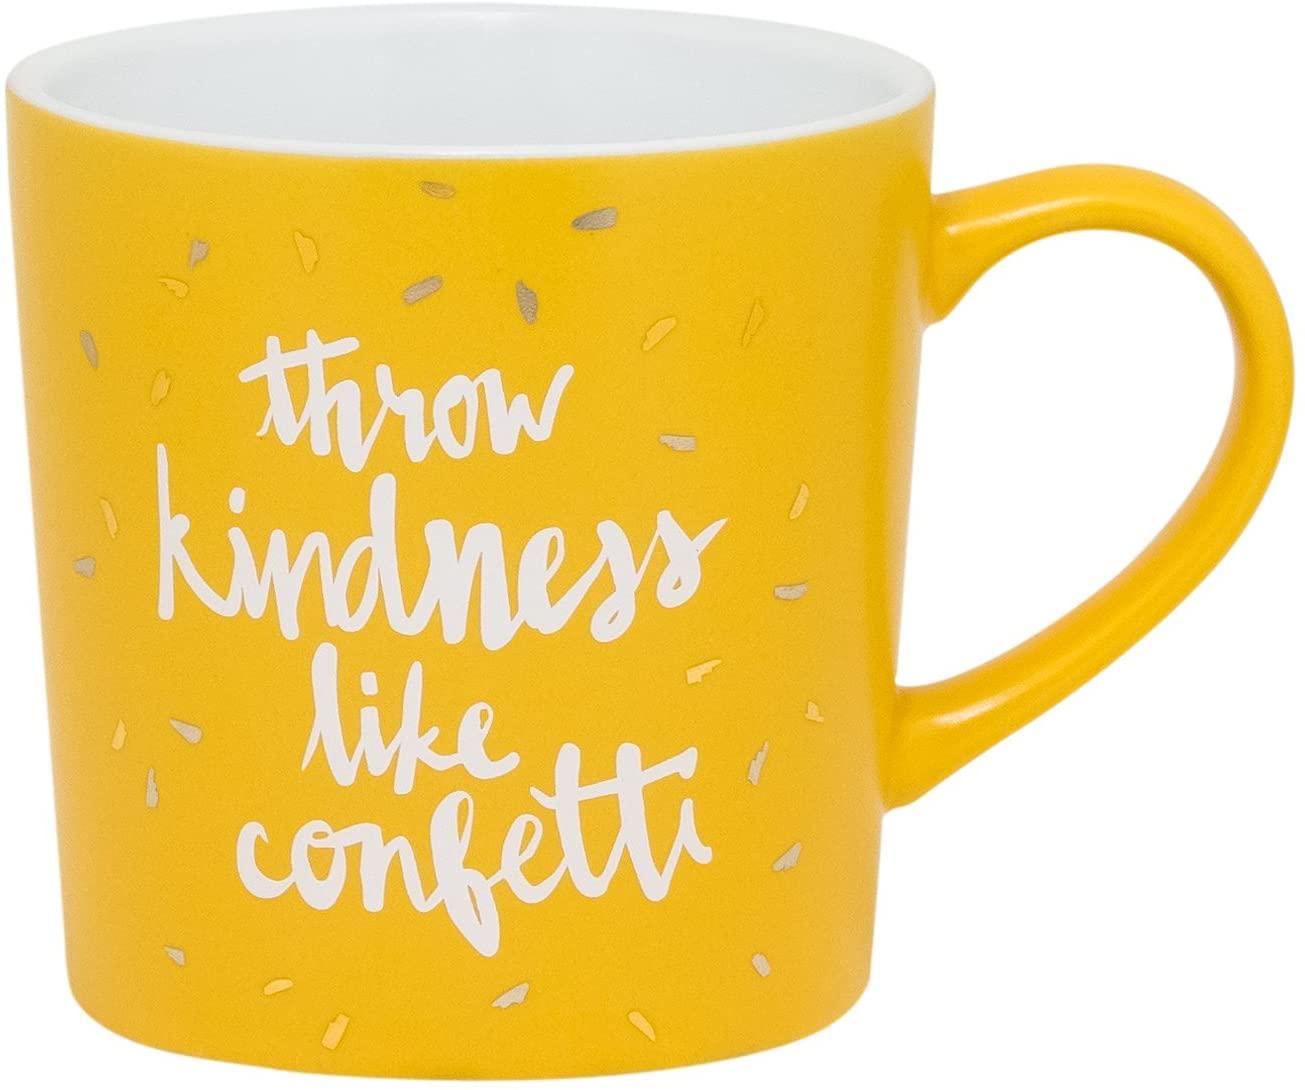 About Face Designs Throw Kindness Like Confetti Ceramic Mug, 18 Ounce, Orange